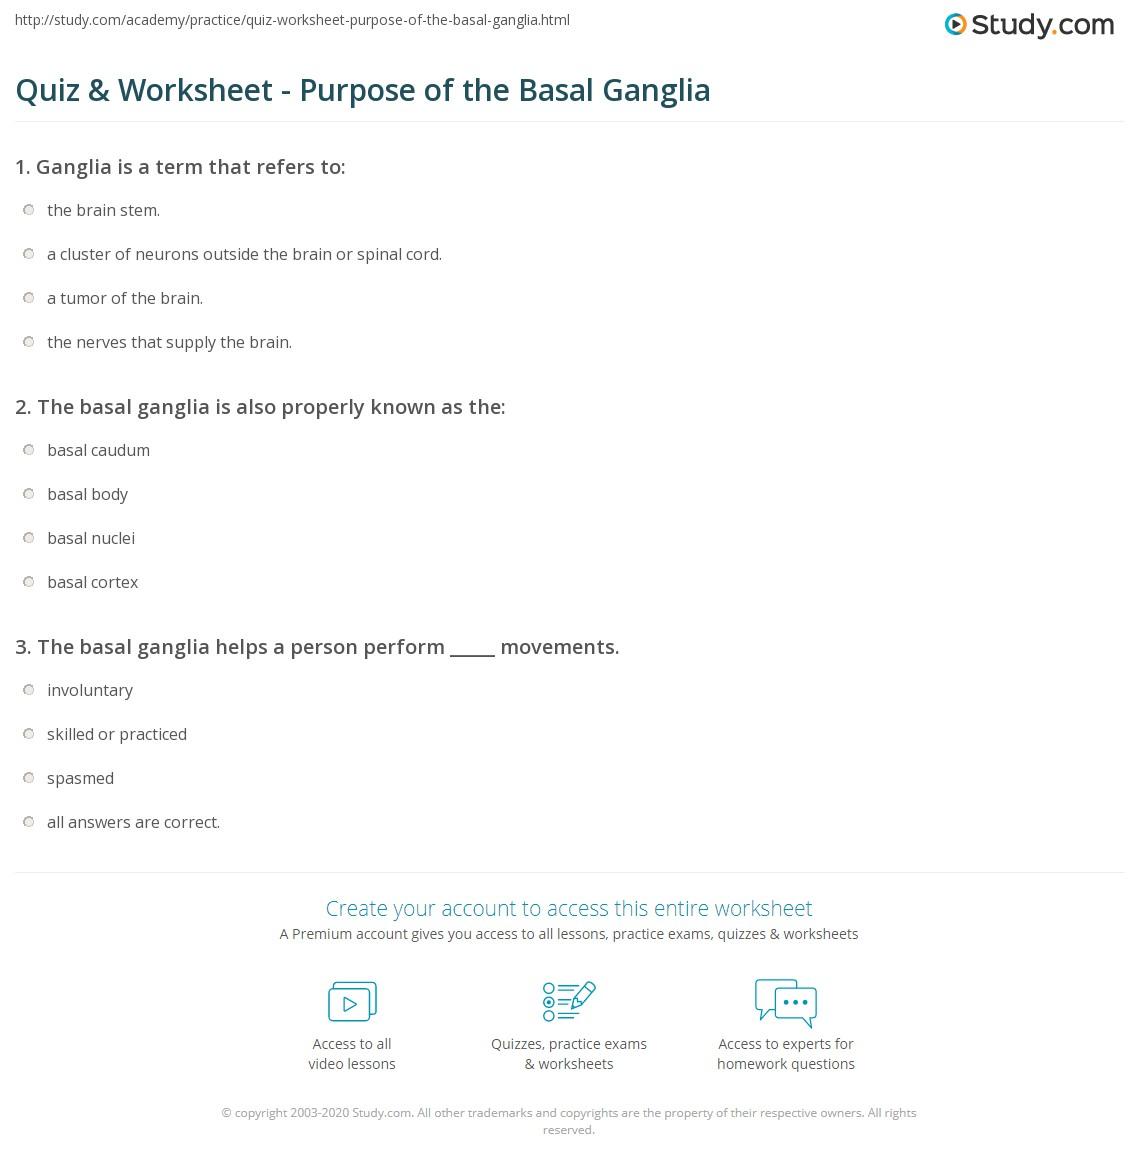 Quiz & Worksheet - Purpose of the Basal Ganglia | Study.com